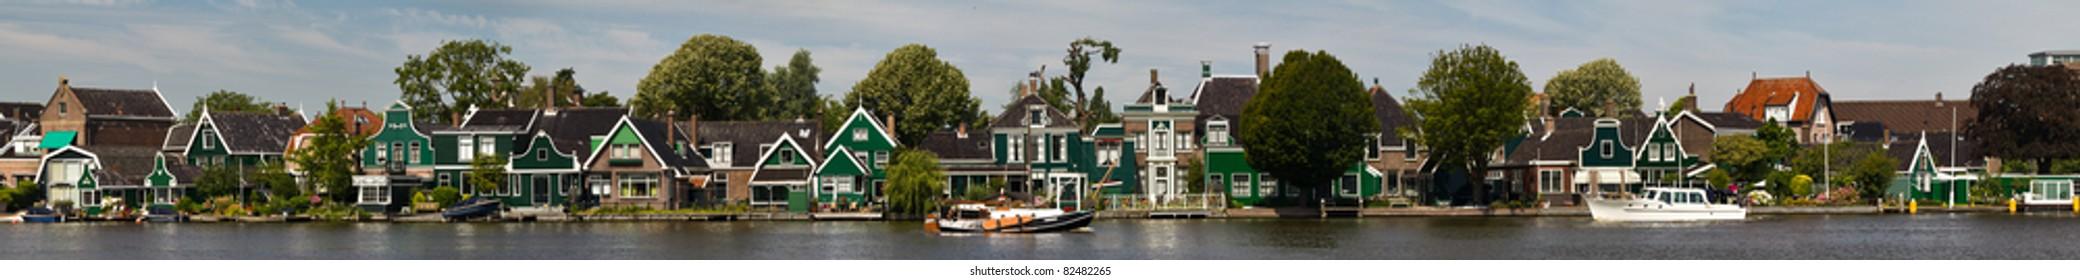 Panorama Zansee in Holland